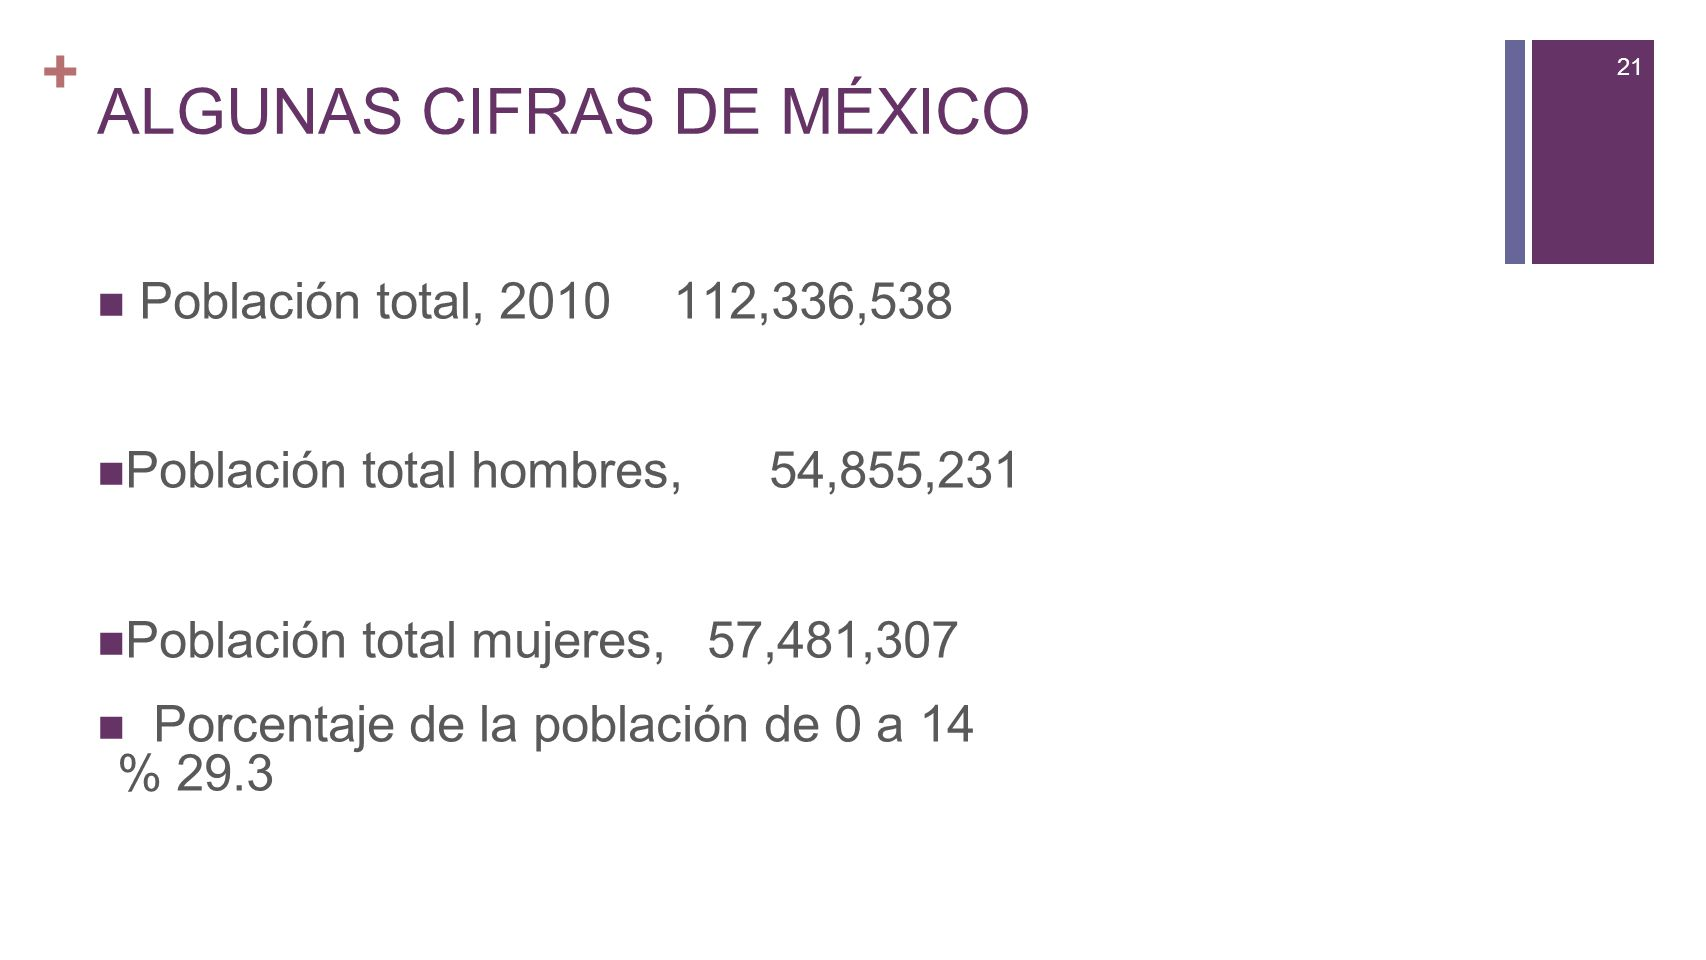 ALGUNAS CIFRAS DE MÉXICO